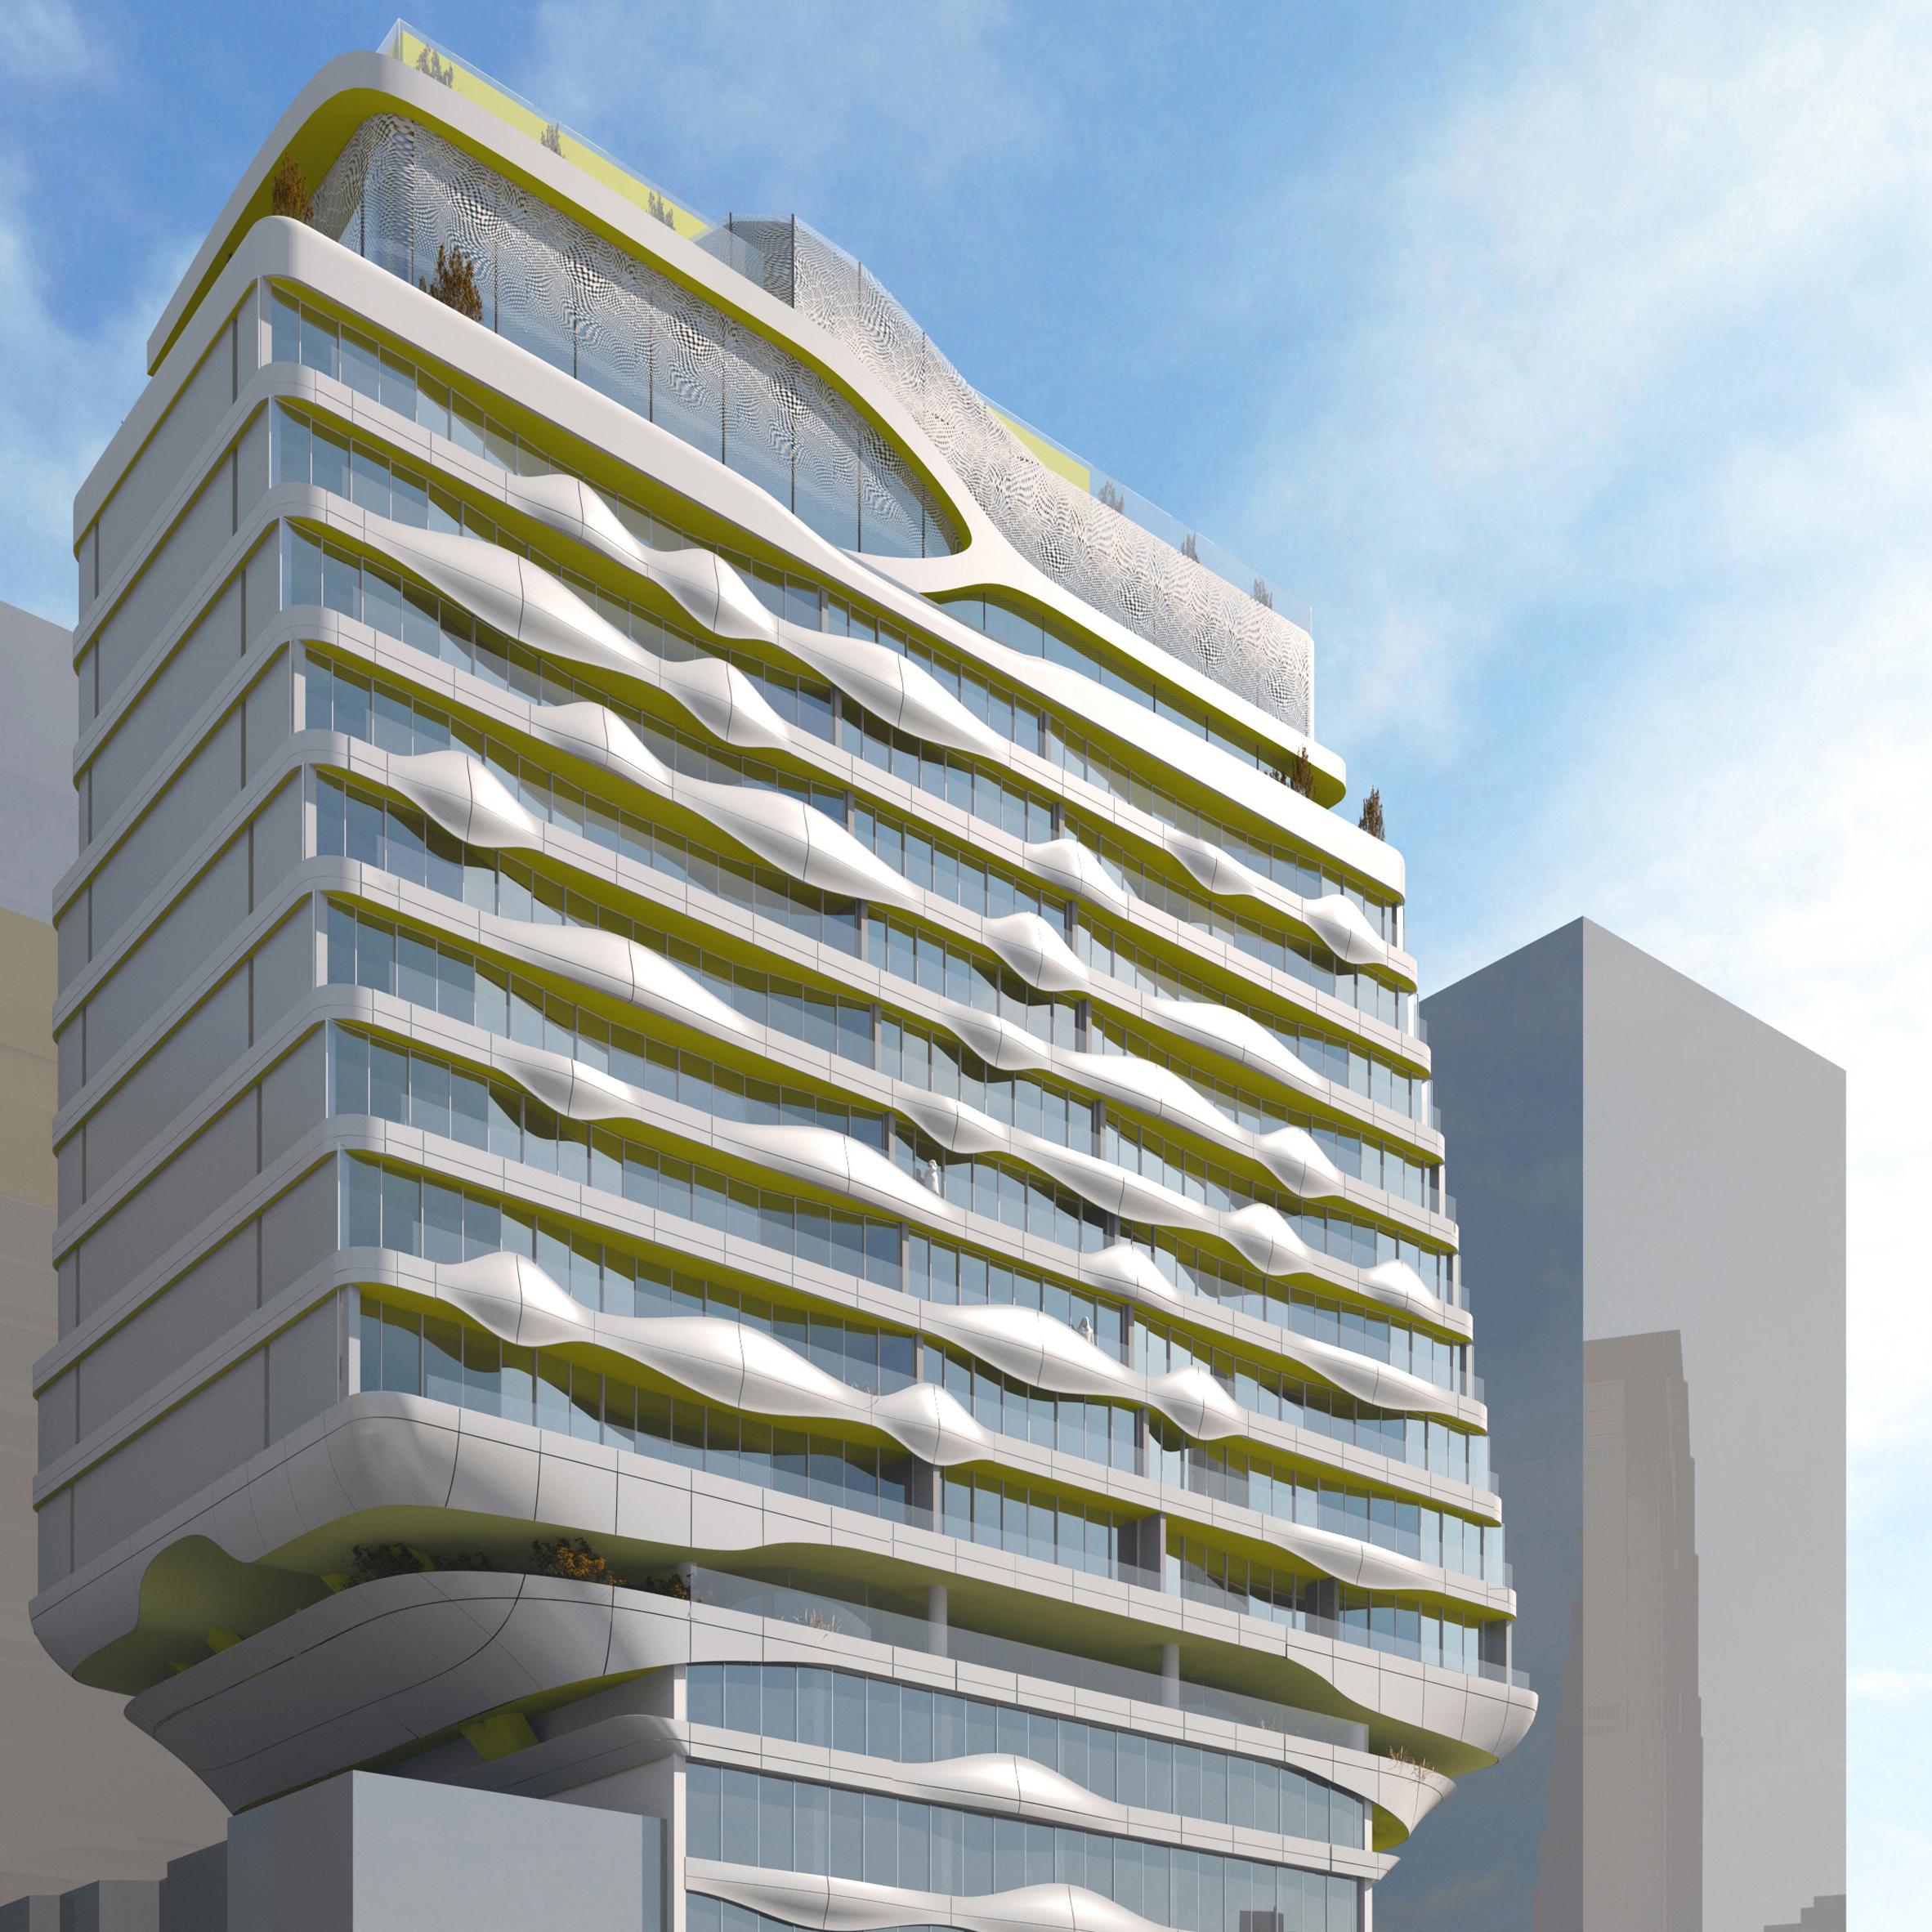 Karim Rashid launches design and development firm Kurv Architecture